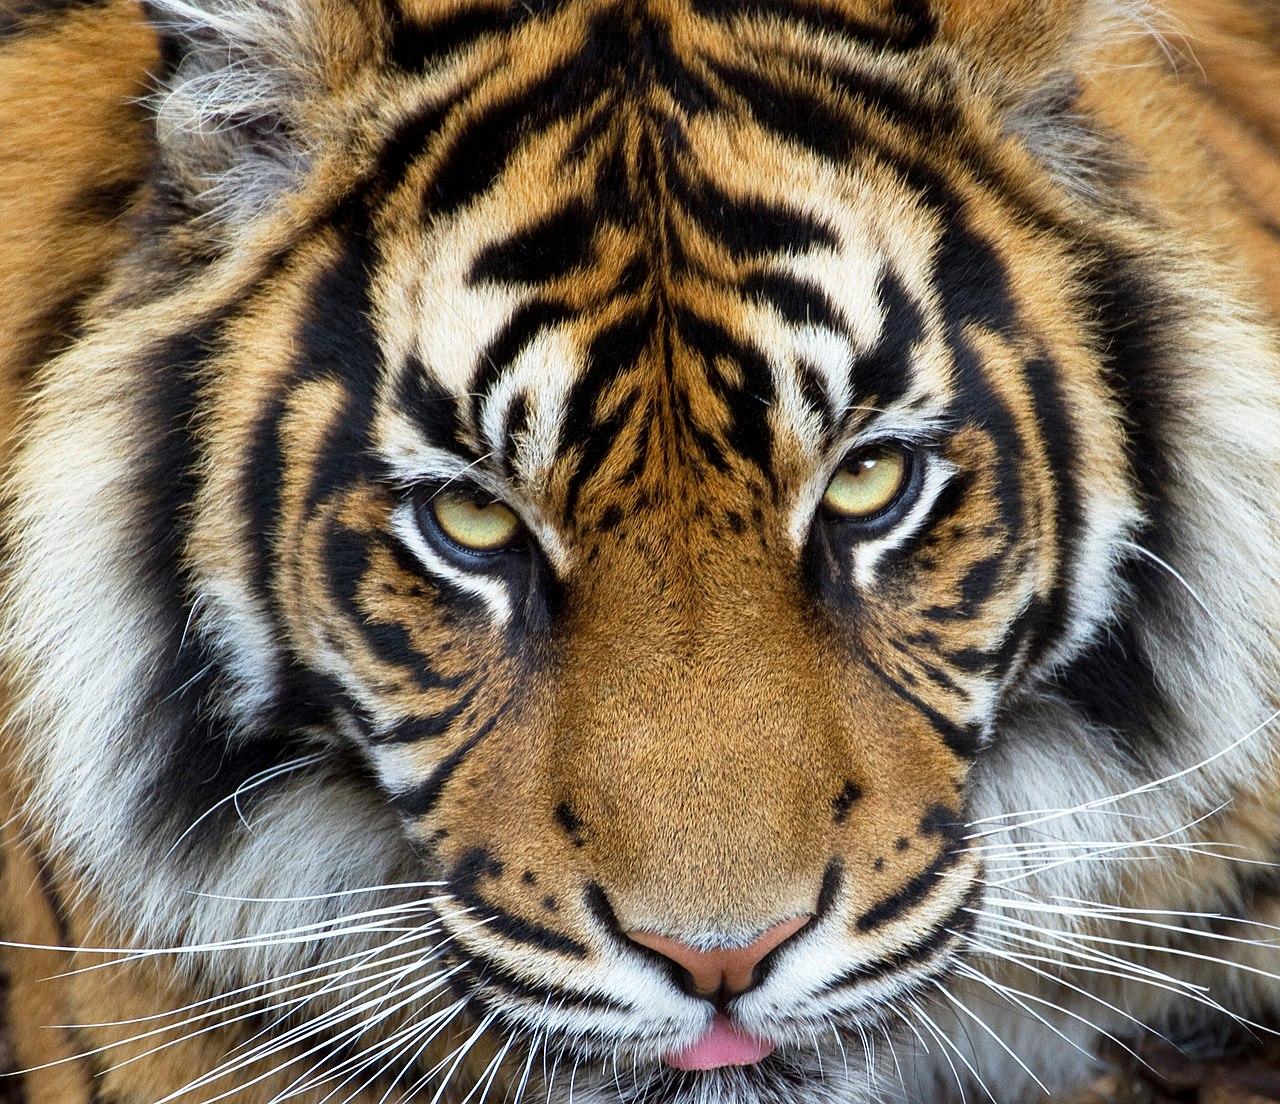 https://upload.wikimedia.org/wikipedia/commons/thumb/e/eb/Sumatran_Tiger_3_%287110769819%29.jpg/1280px-Sumatran_Tiger_3_%287110769819%29.jpg